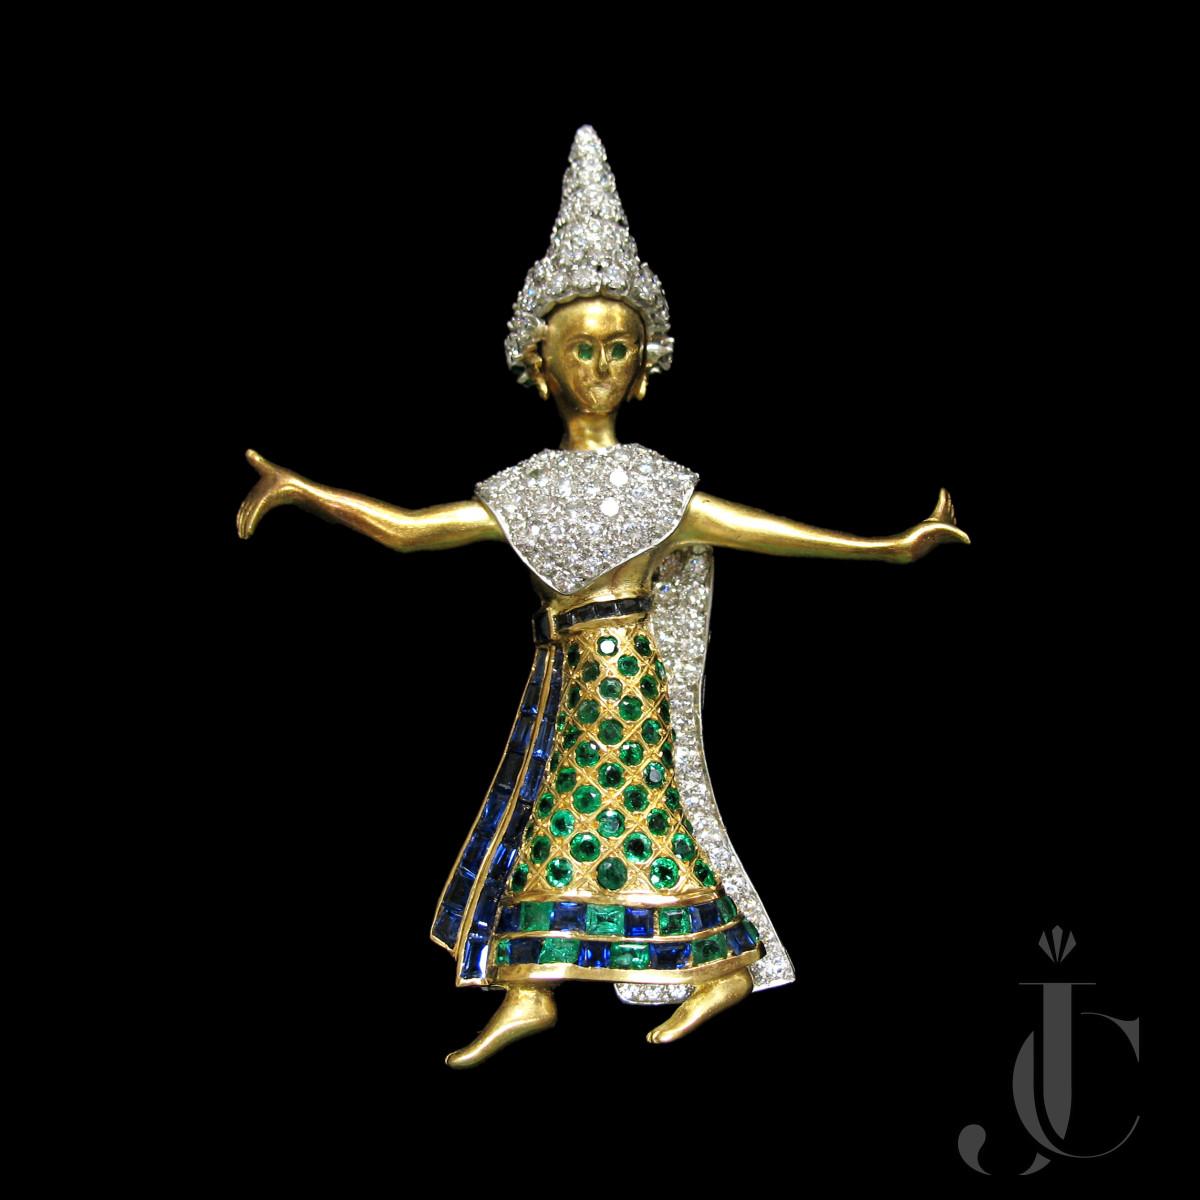 18kt and Plat Diamond and Gem Set Thai Lady Brooch, New York, circa 1958